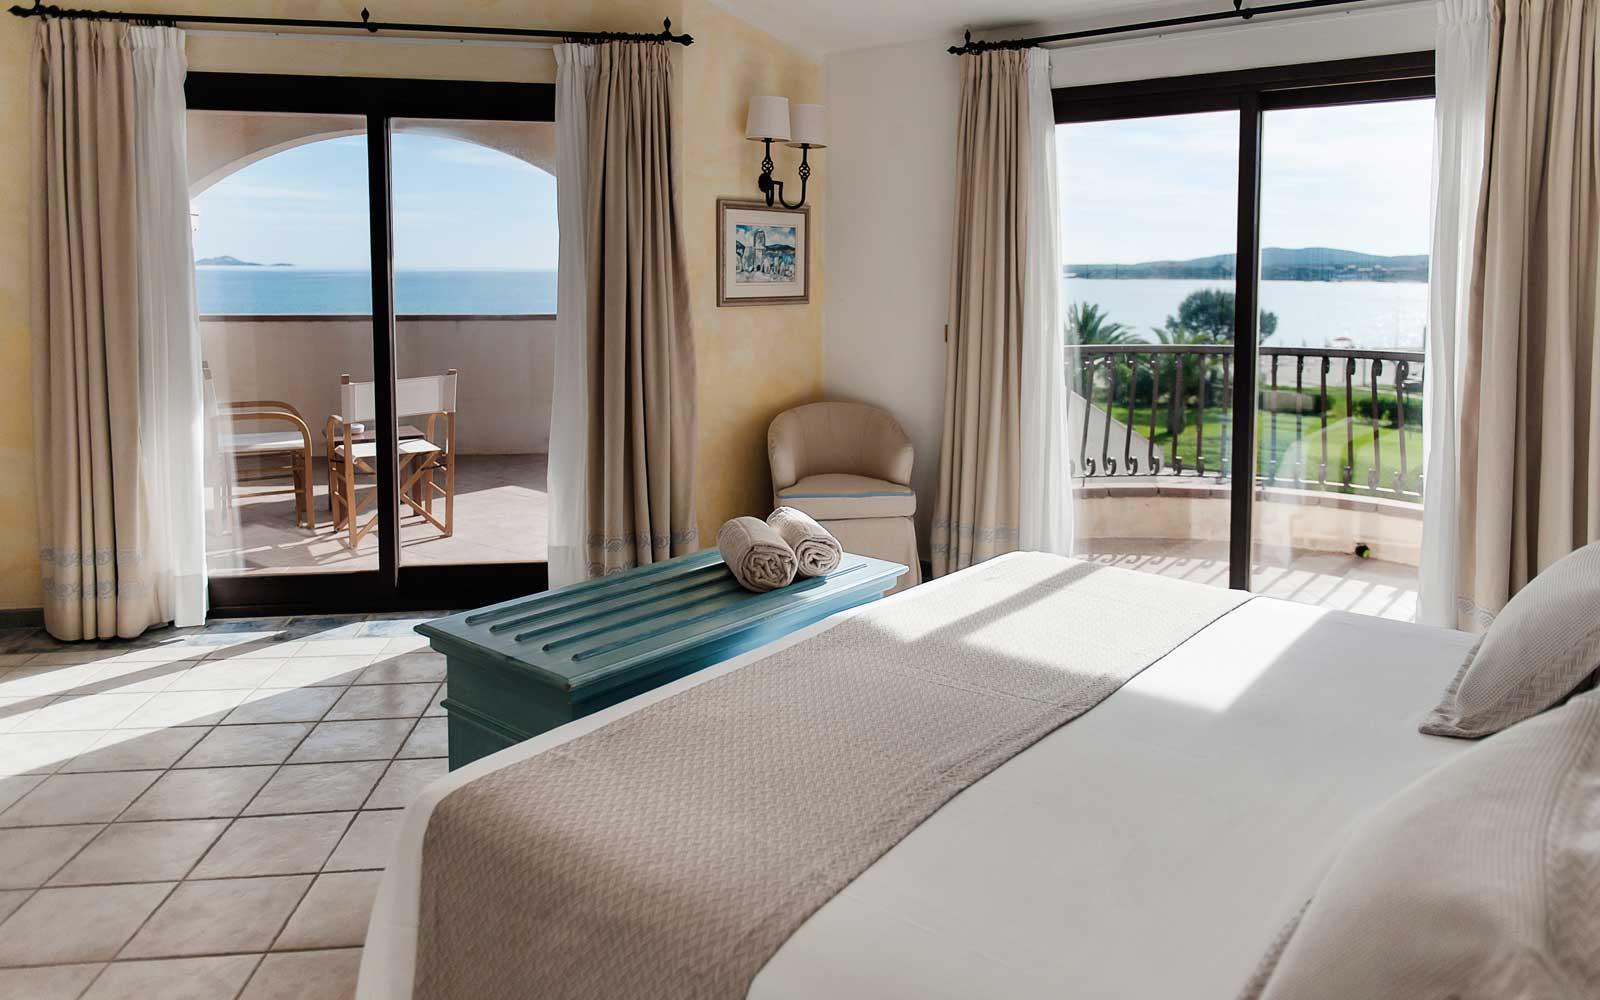 Superior Room at Hotel Abi D'oru